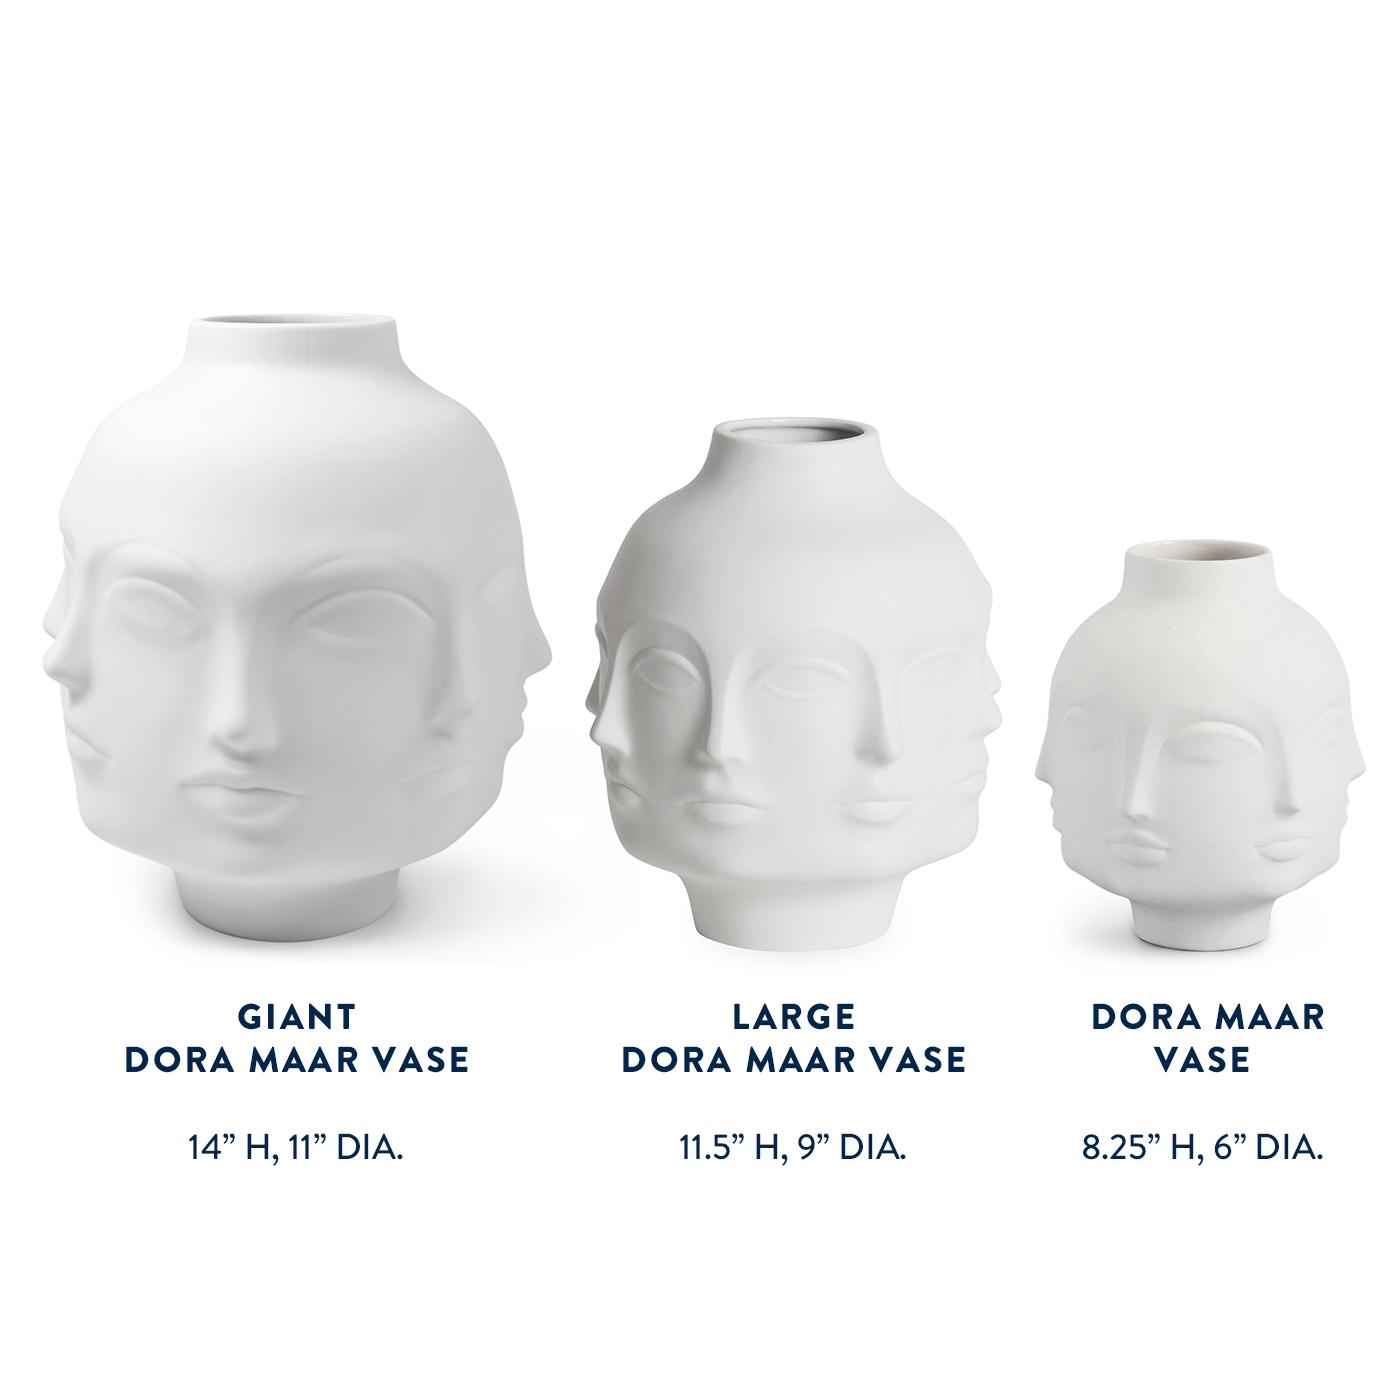 Large Dora Maar Vase